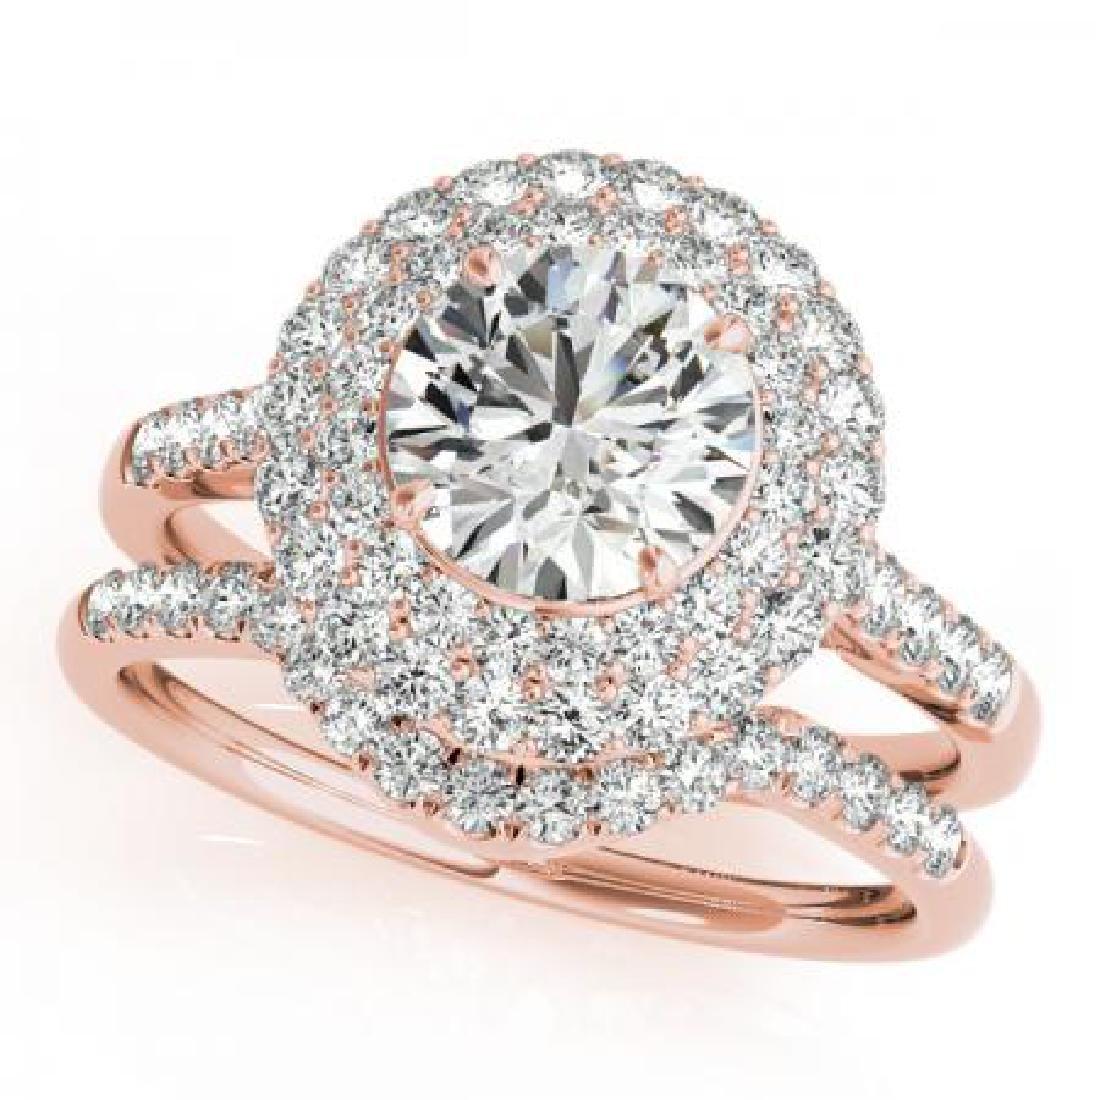 CERTIFIED 14KT ROSE GOLD 1.24 CT G-H/VS-SI1 DIAMOND HAL